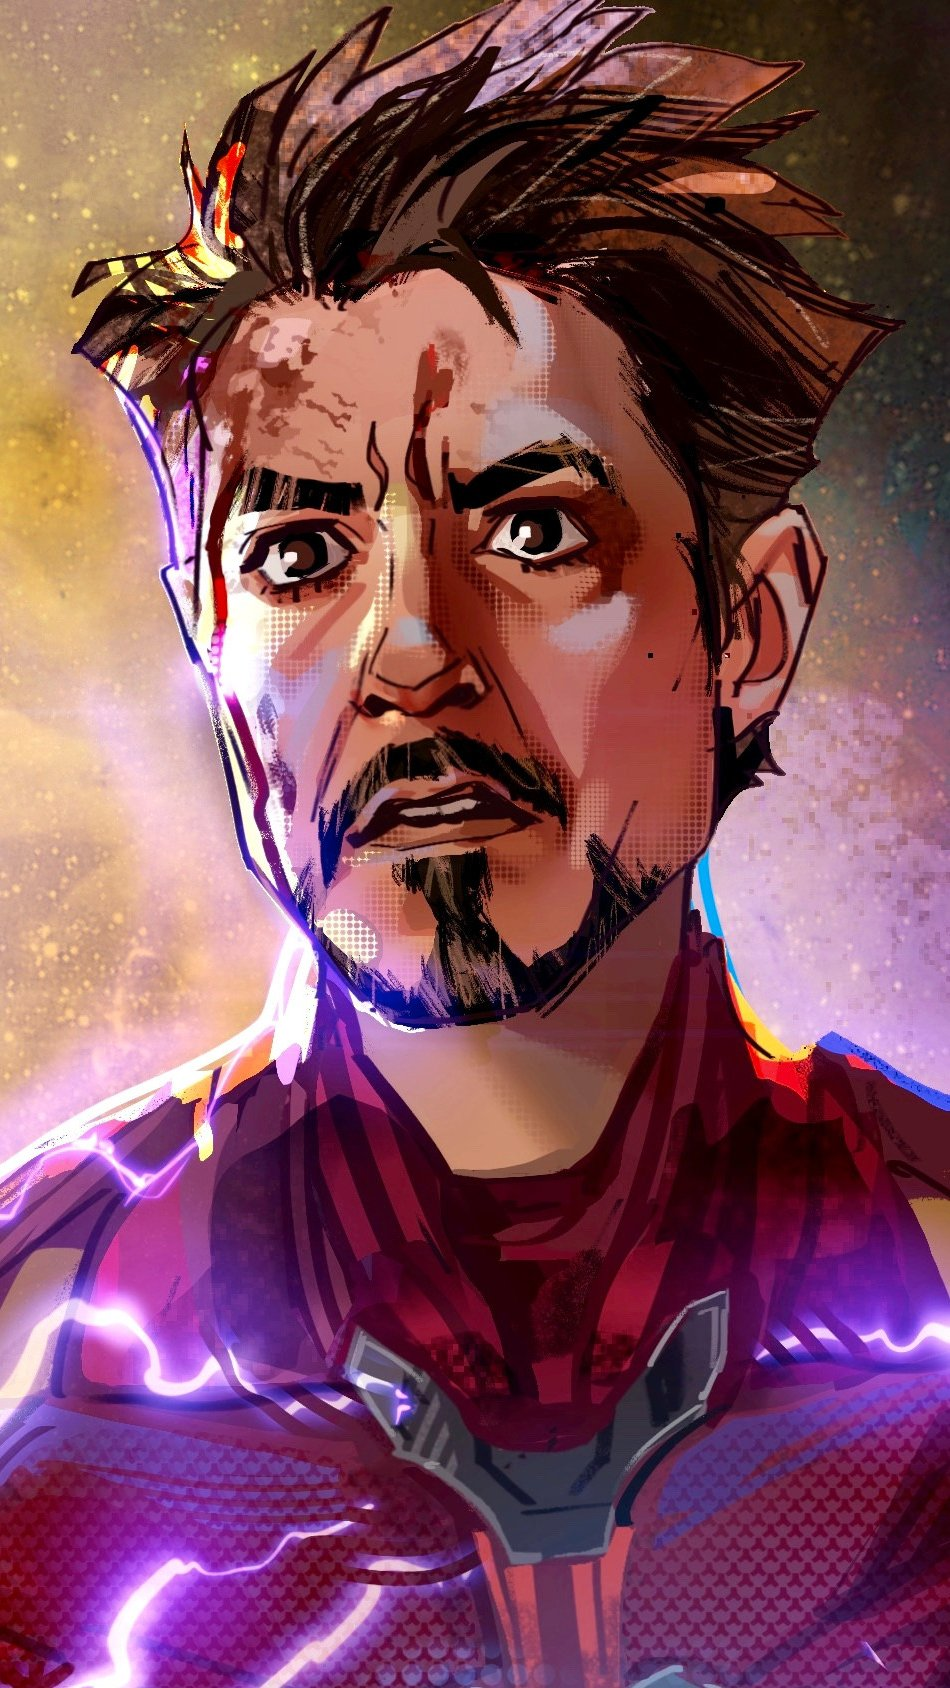 Wallpaper Iron man with gauntlet Vertical